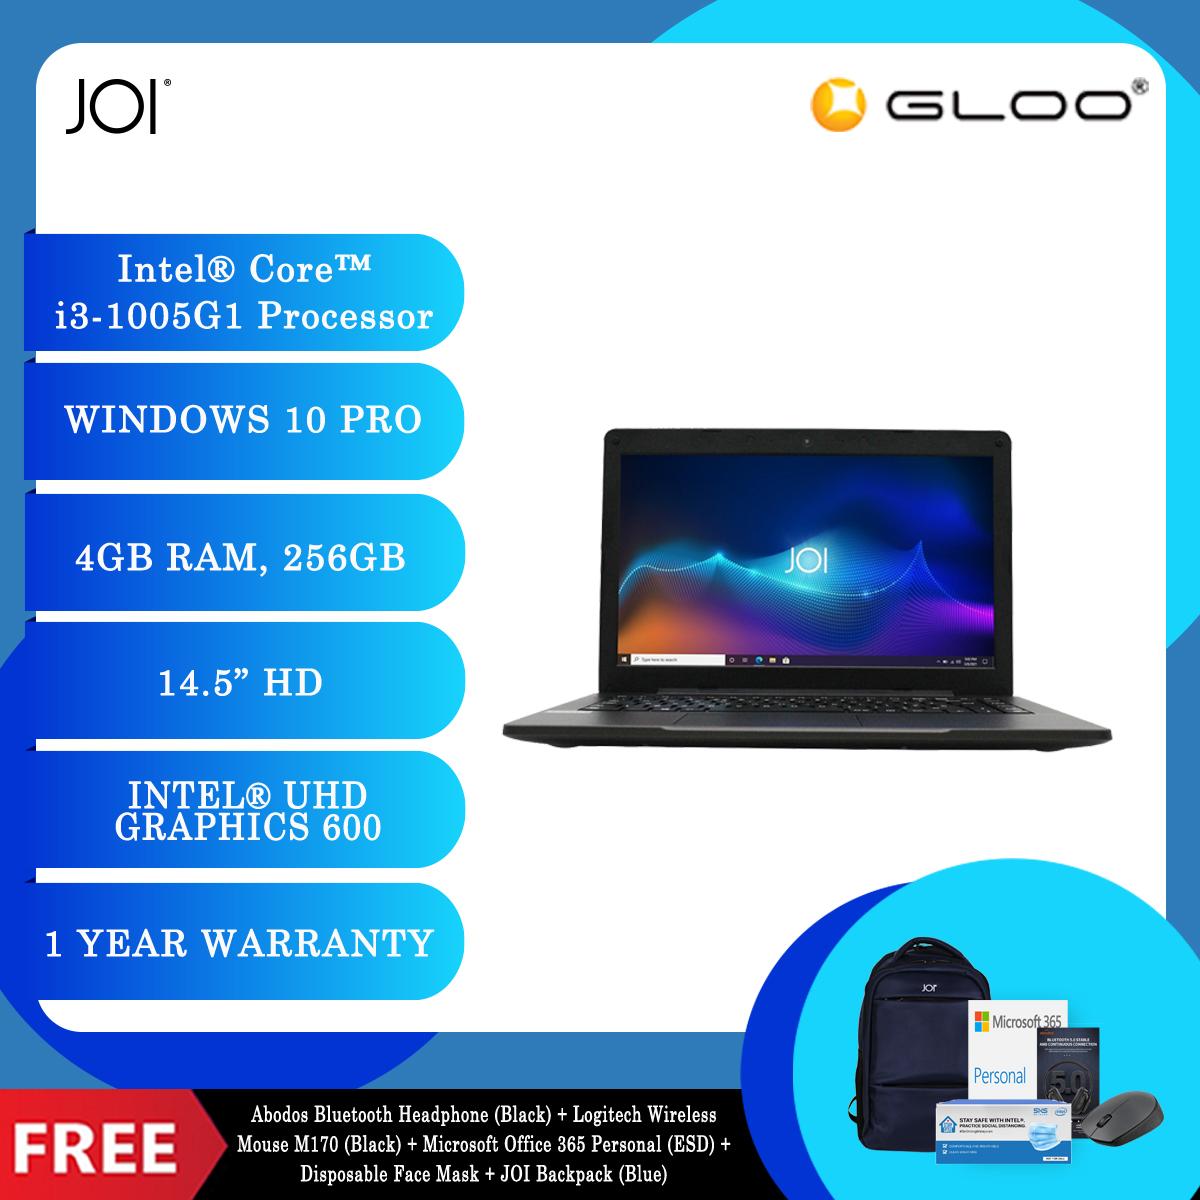 JOI Classmate 30 + Abodos Bluetooth Headphone Black  + Logitech Wireless Mouse M170 (Black) + Microsoft Office 365 Personal (ESD) + Disposable 3 Layer Face Mask + JOI Backpack (Blue) [BPPJOI0C30HMBL]